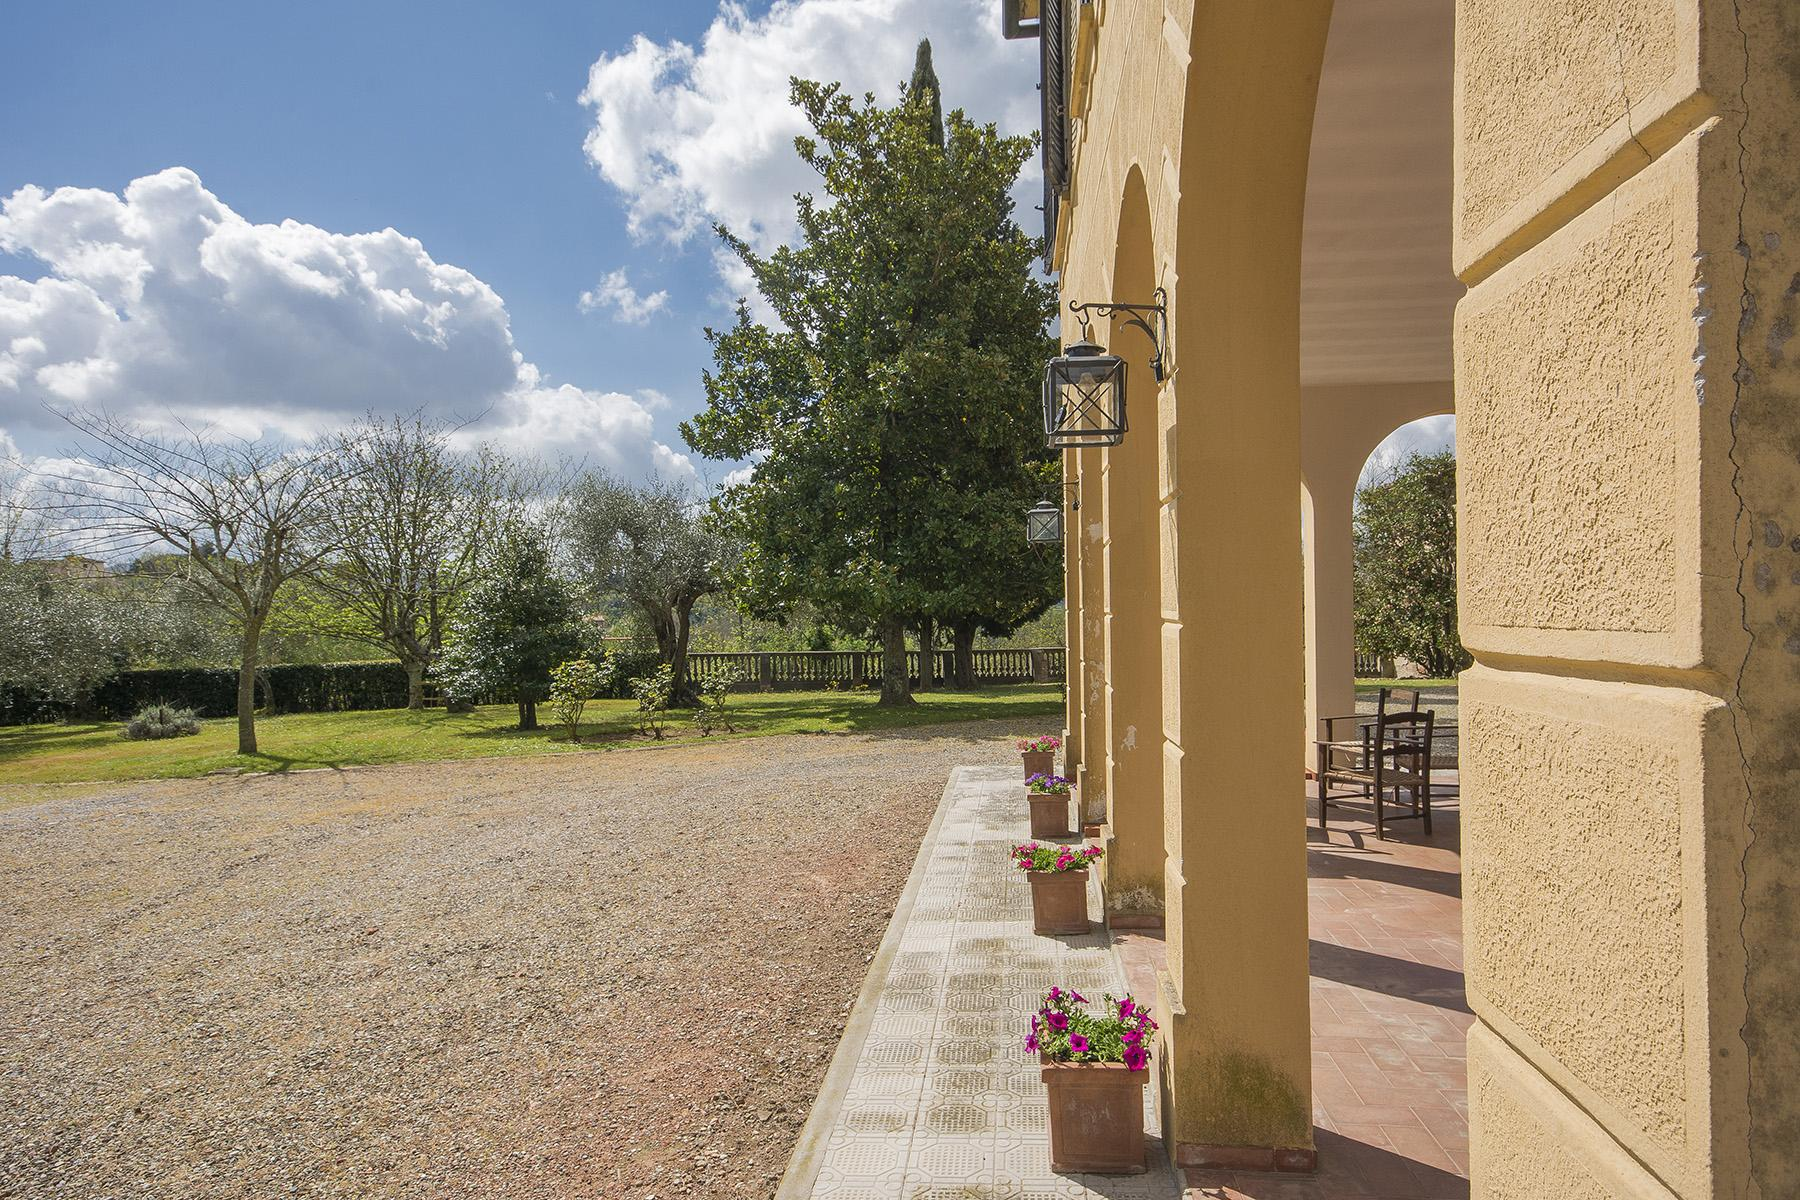 Elégante villa sur les collines toscanes - 7